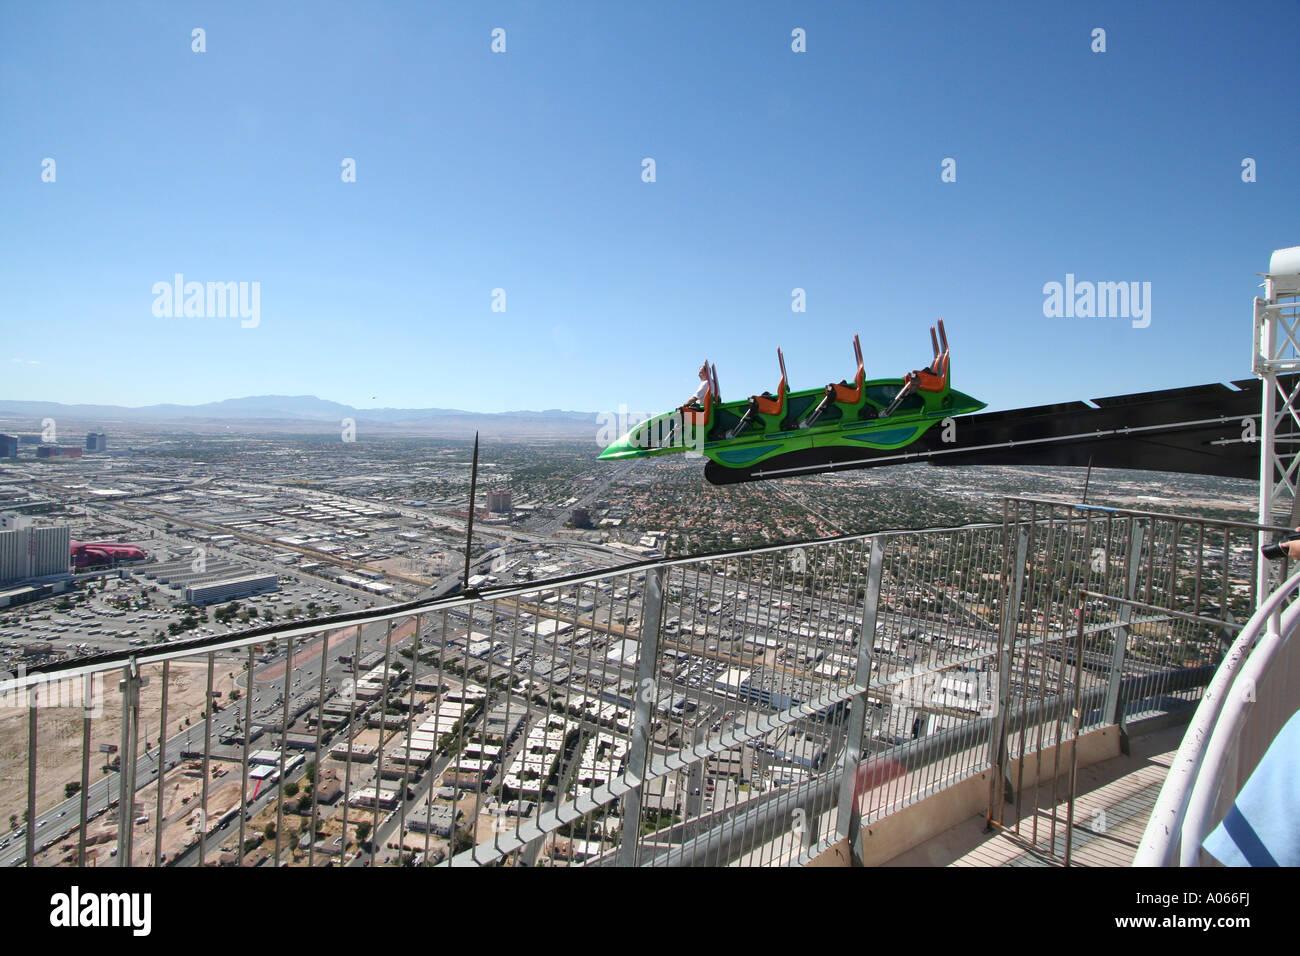 X Scream Thrill Ride Das Stratosphere Hotel Las Vegas Nevada